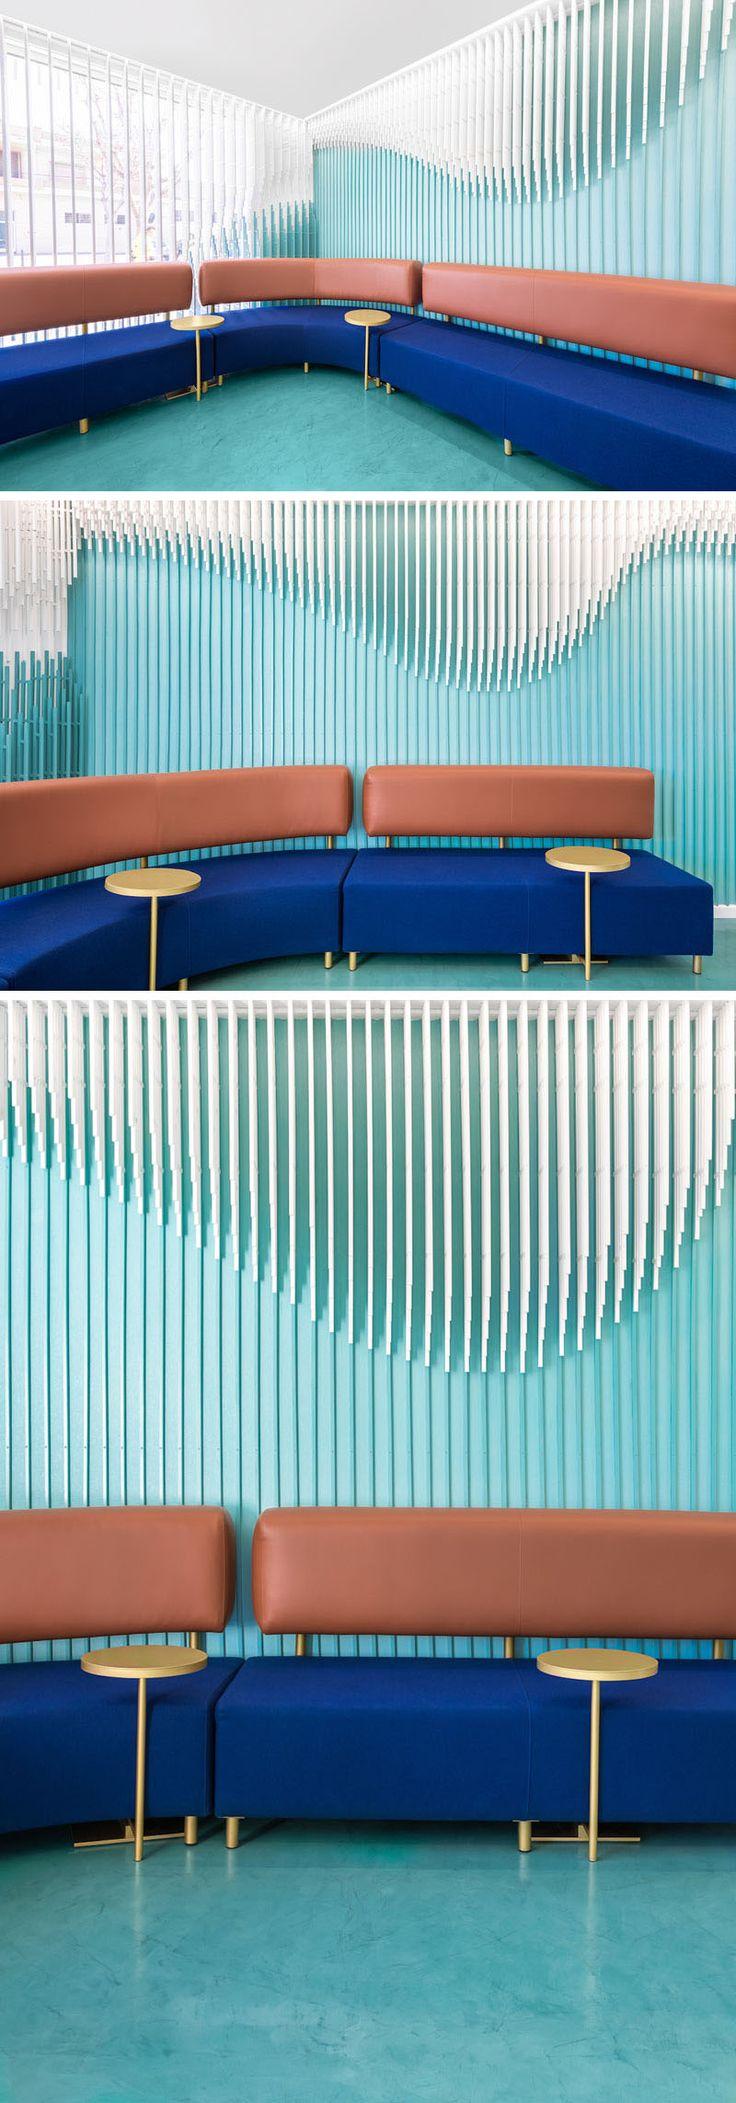 Waiting Room Design Ideas: Best 25+ Office Waiting Rooms Ideas On Pinterest